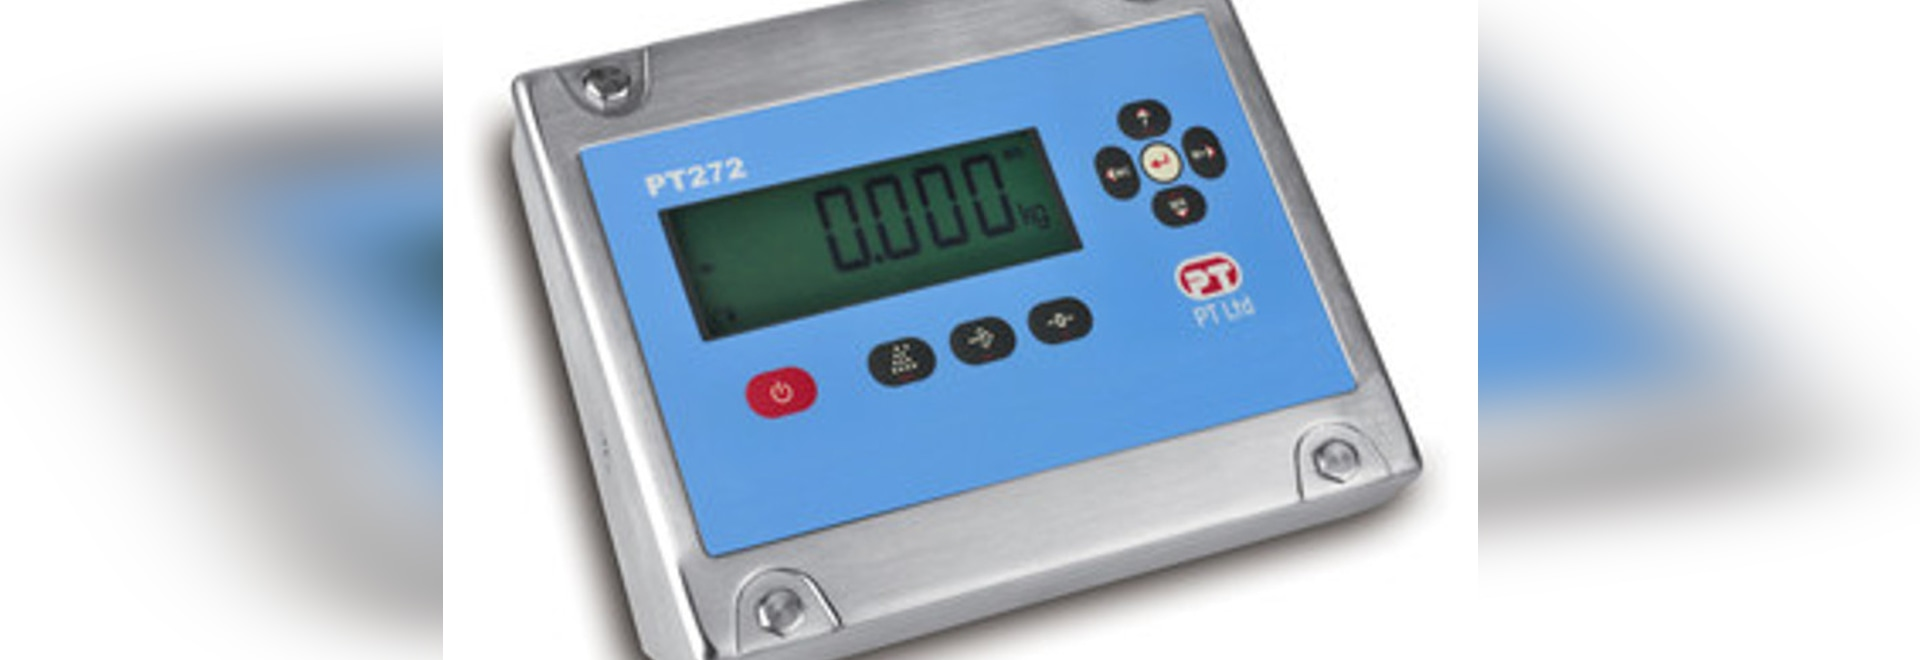 PT272 Digital Indicator